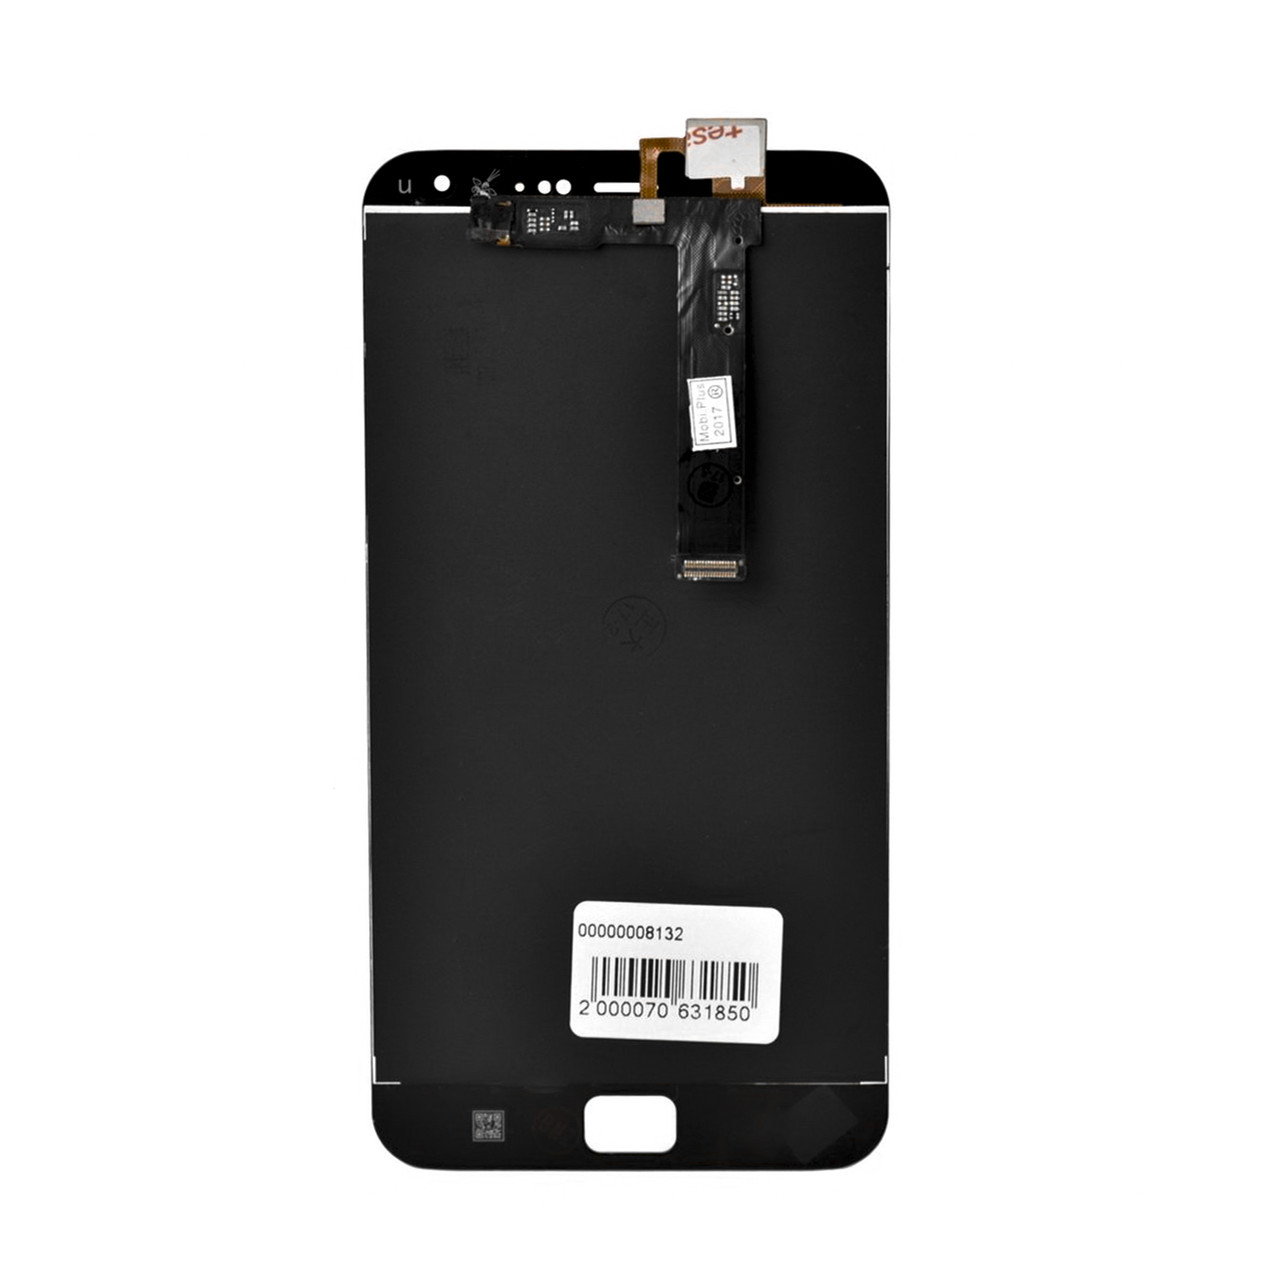 Дисплей Meizu MX4 pro в сборе Black (63)